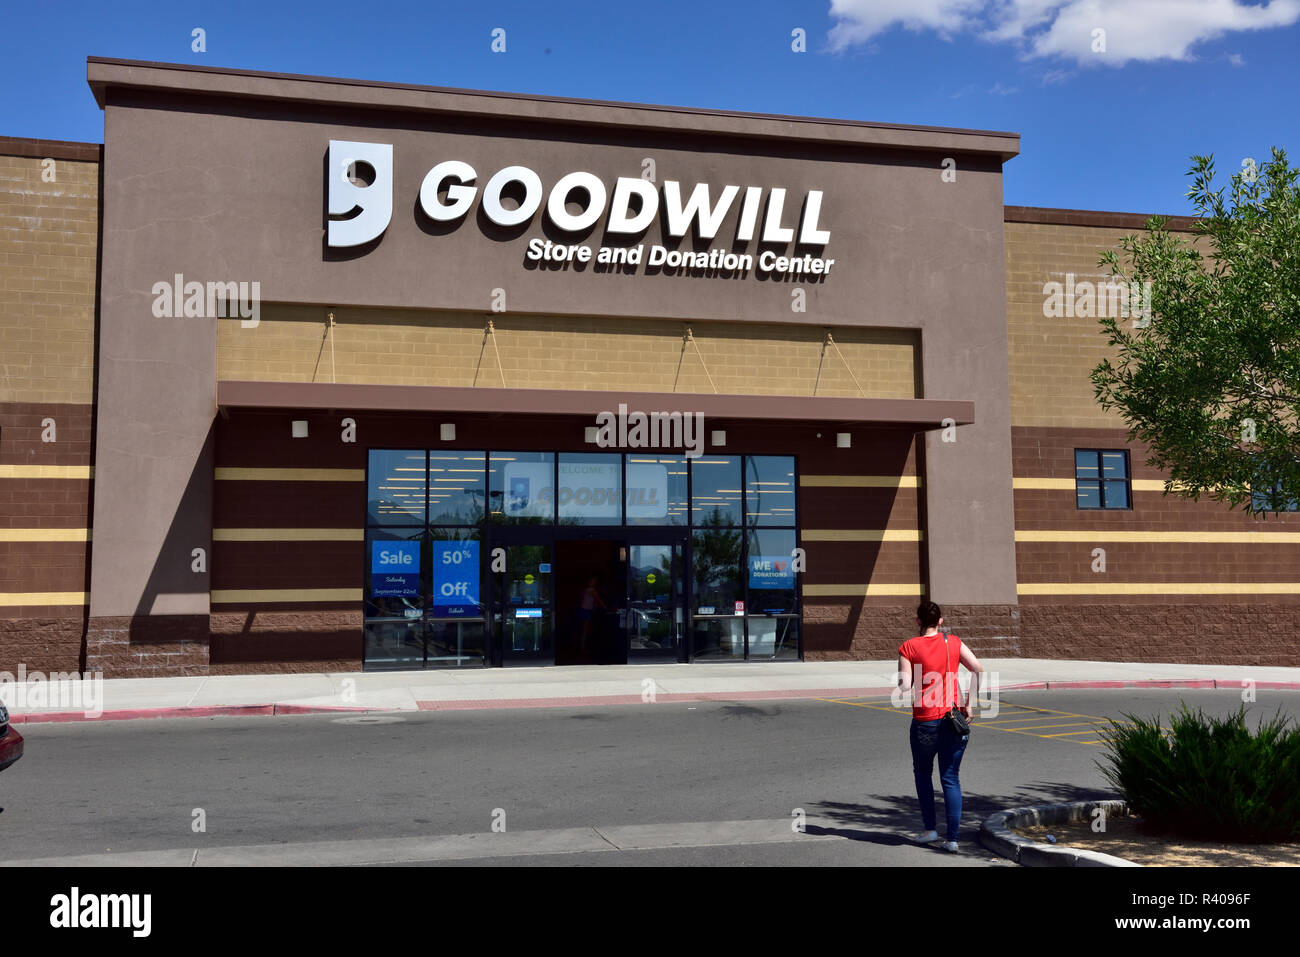 Goodwill store and donation center, Arizona, USA - Stock Image